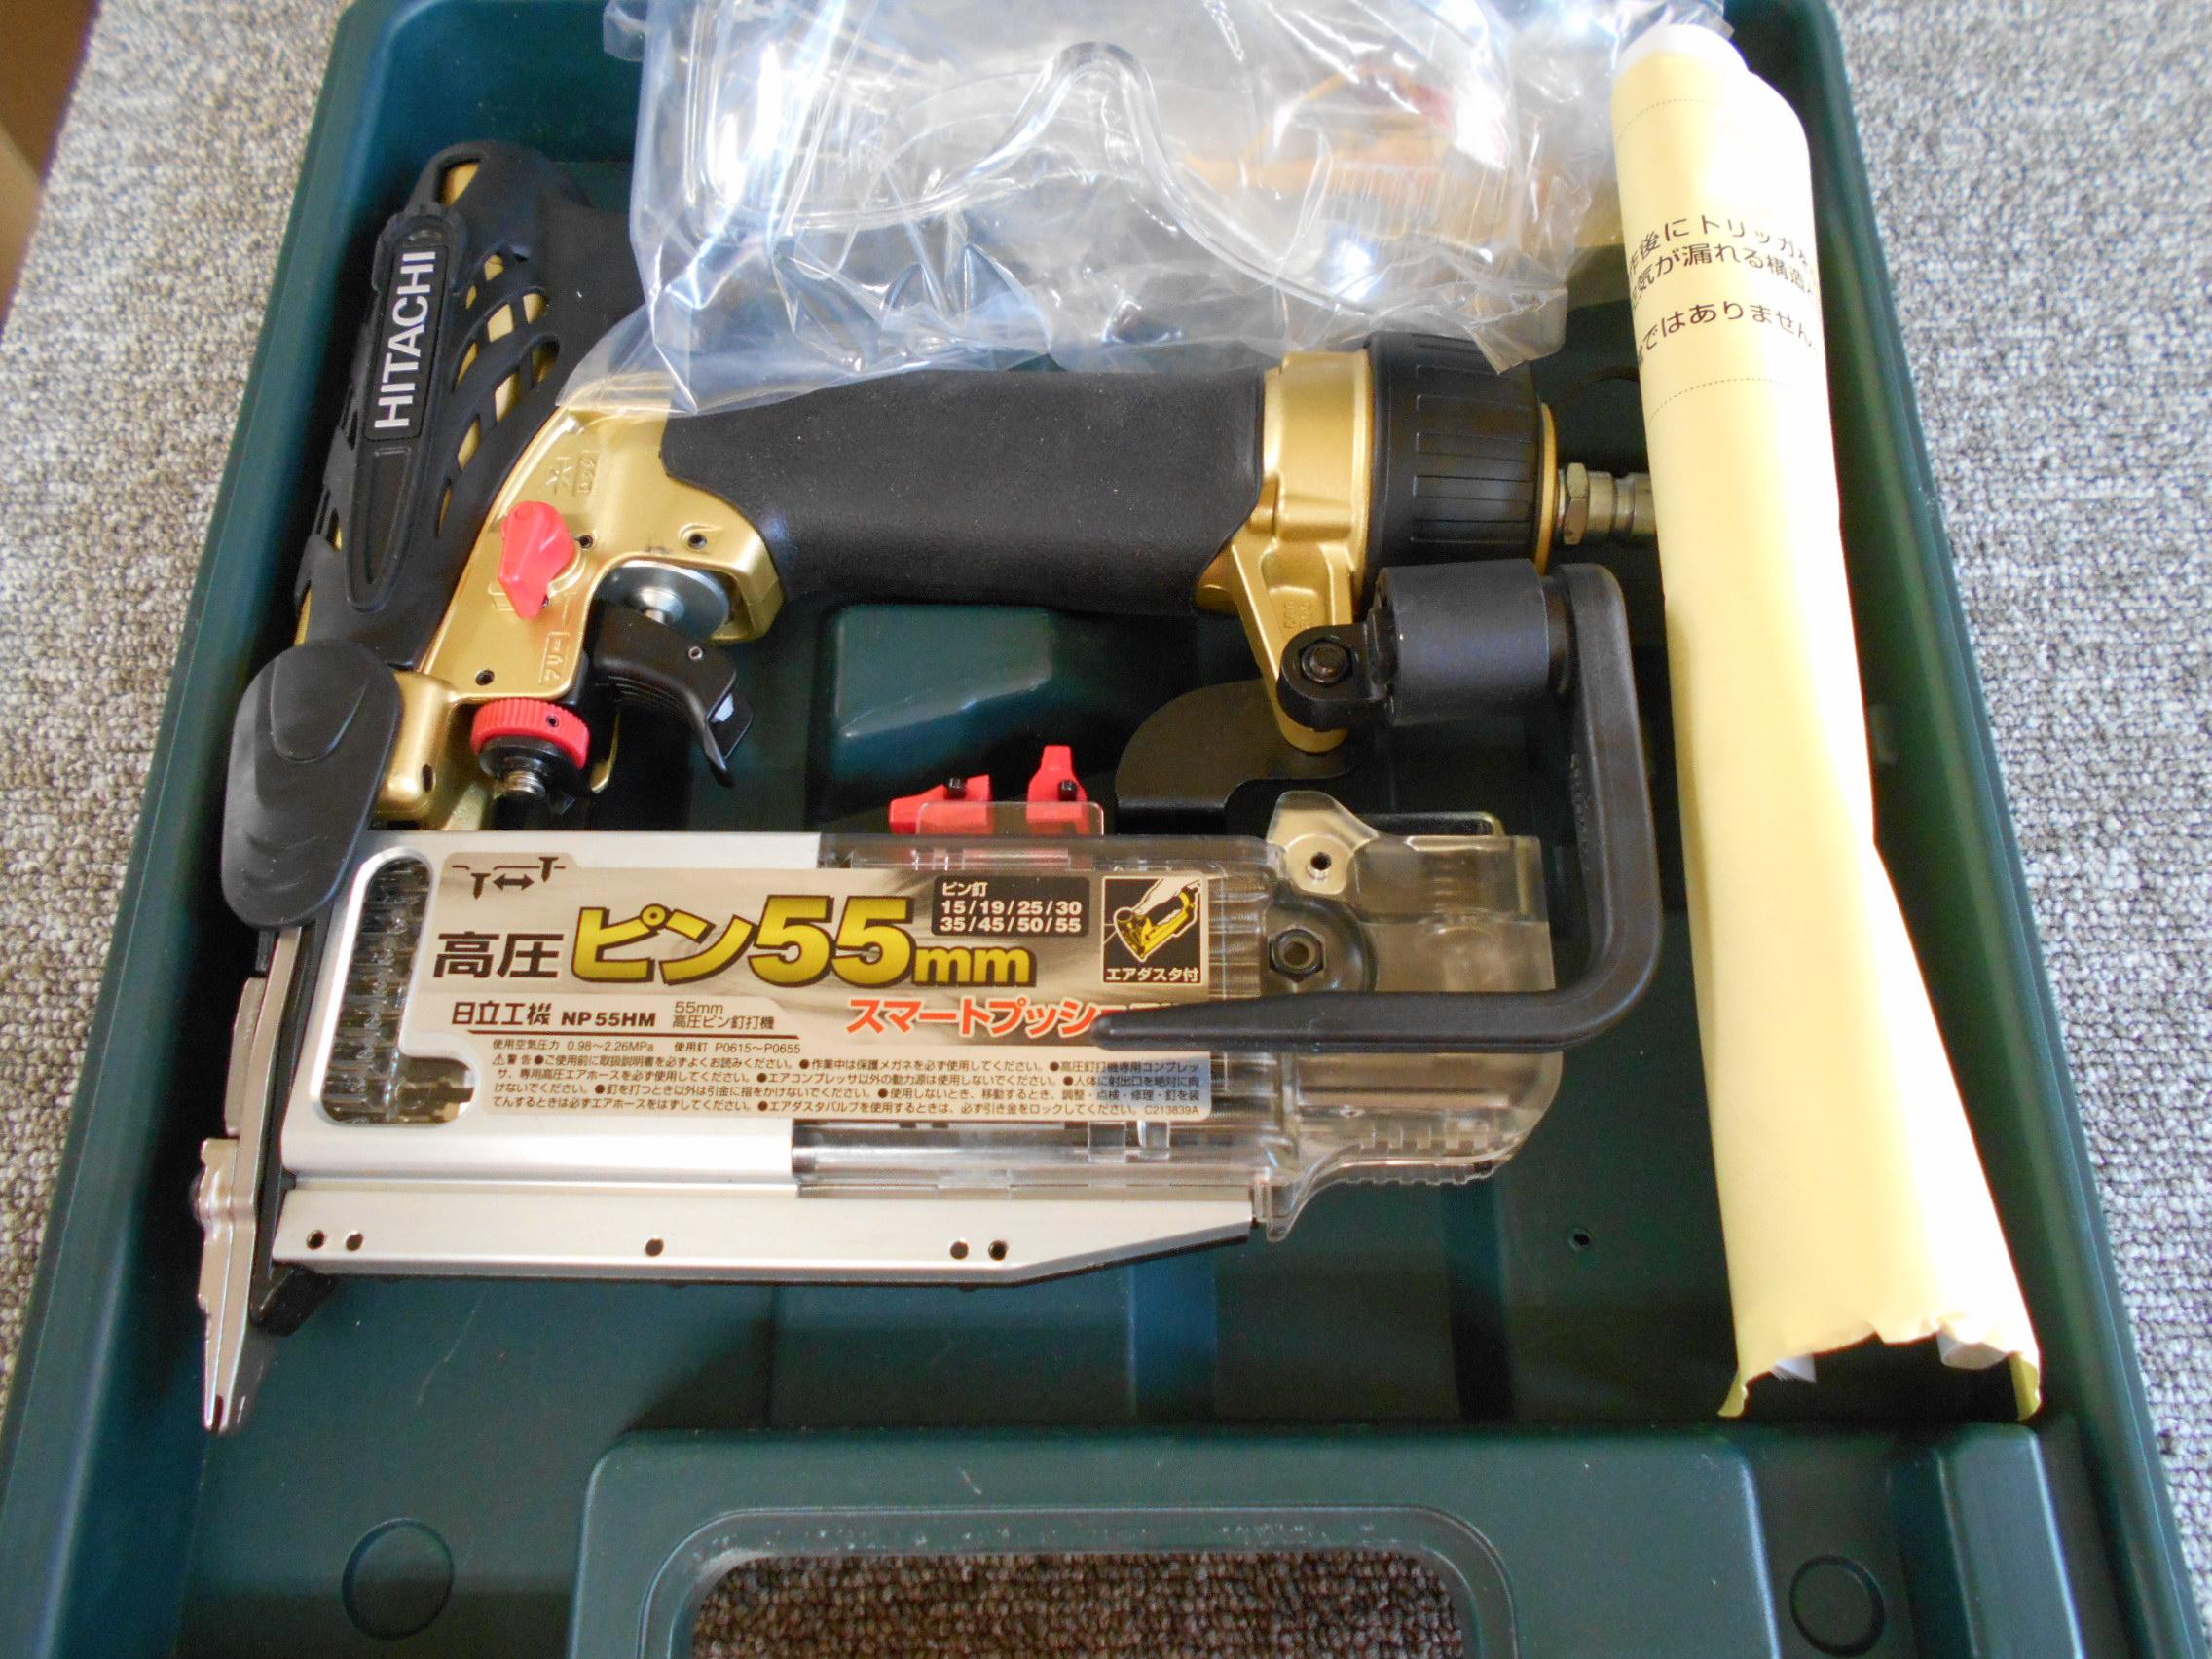 日立 高圧ピン釘打機 NP55HM